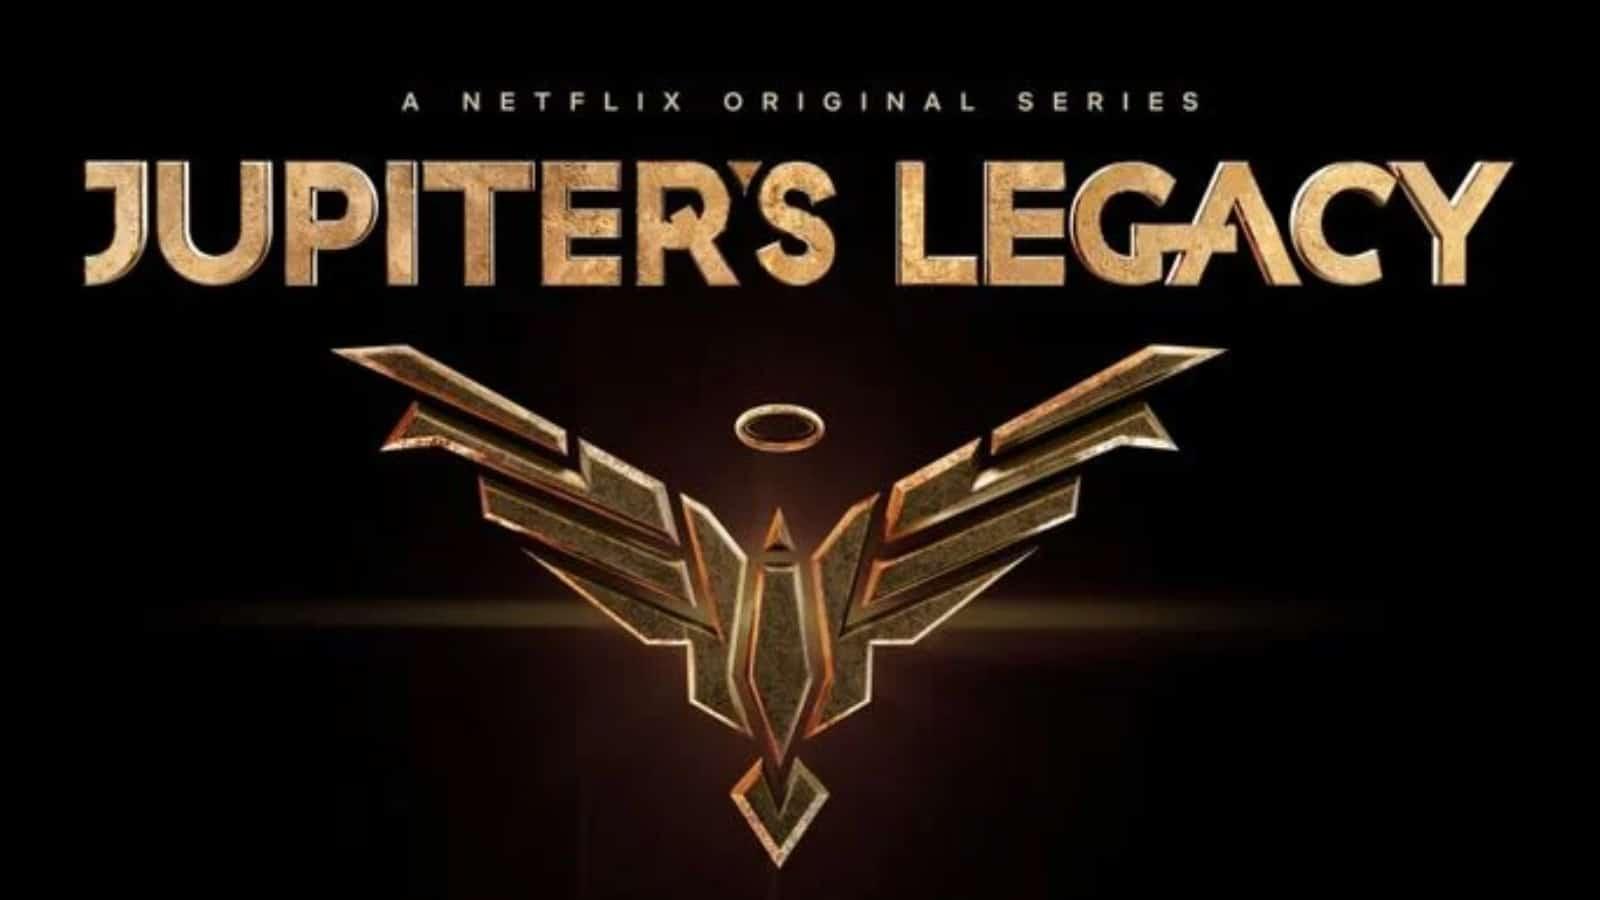 jupiters legacy netflix